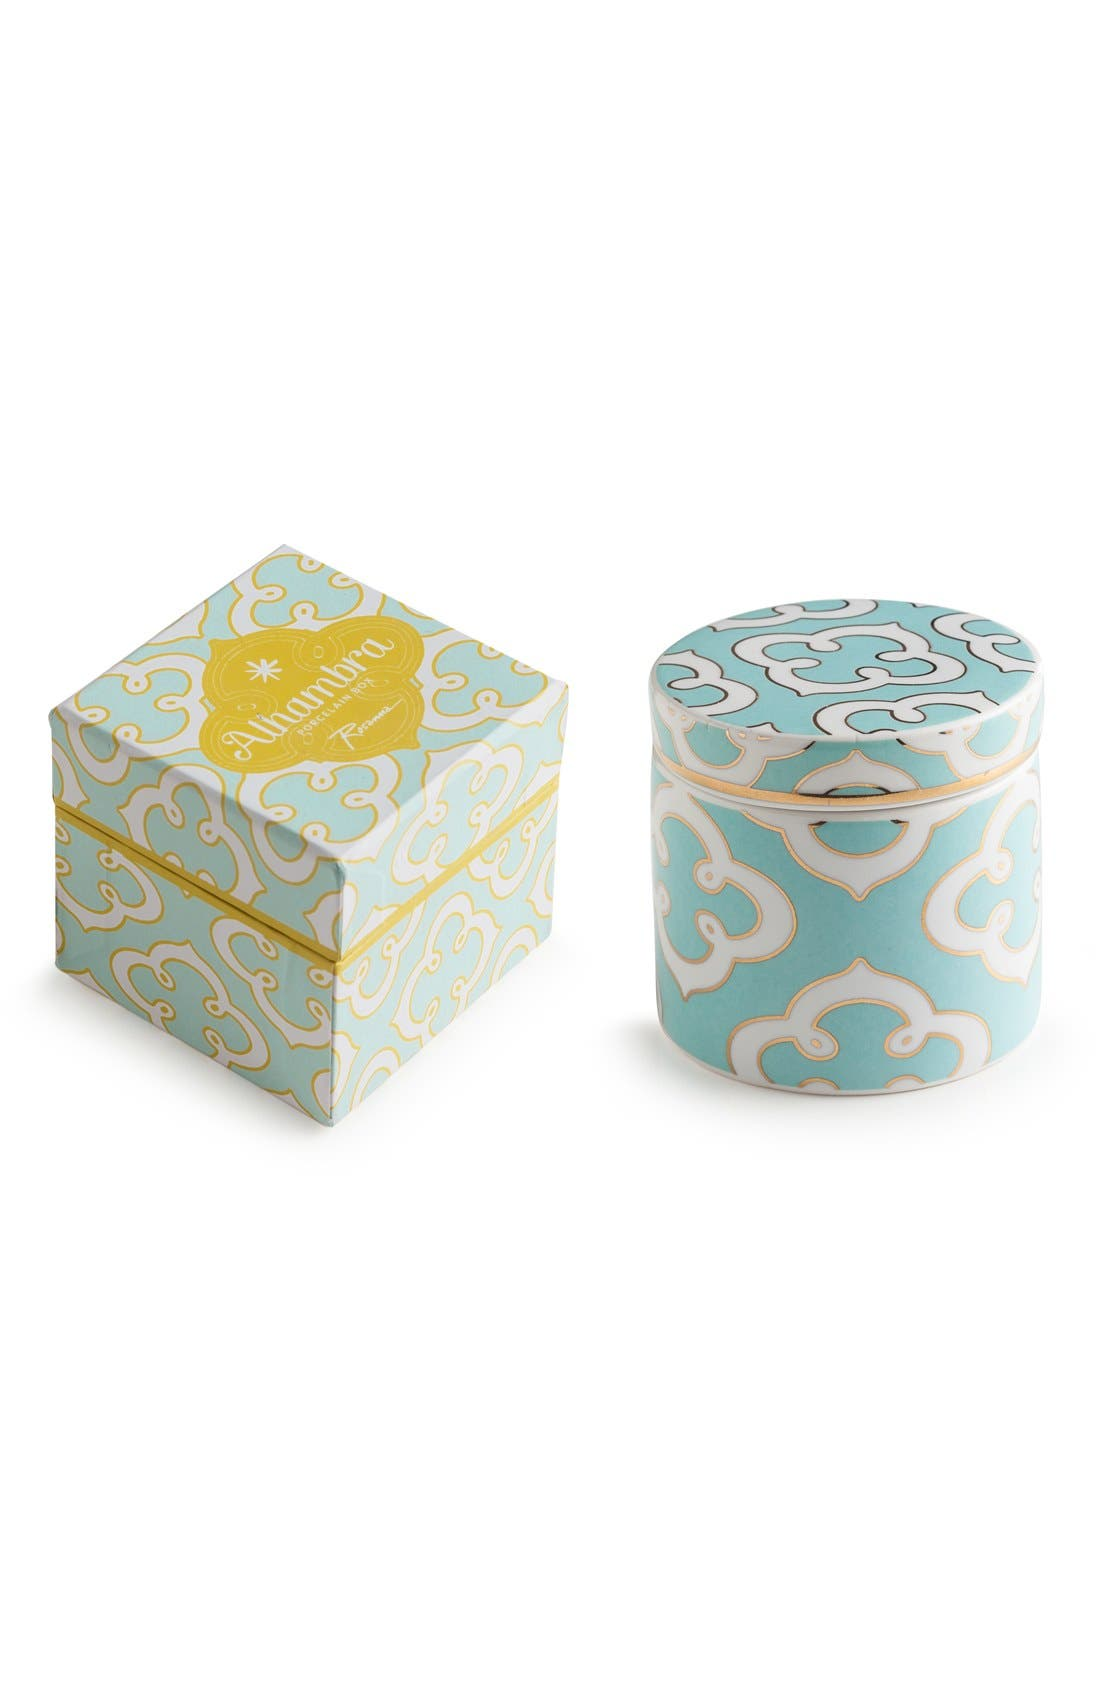 Rosanna 'Alhambra' Porcelain Box